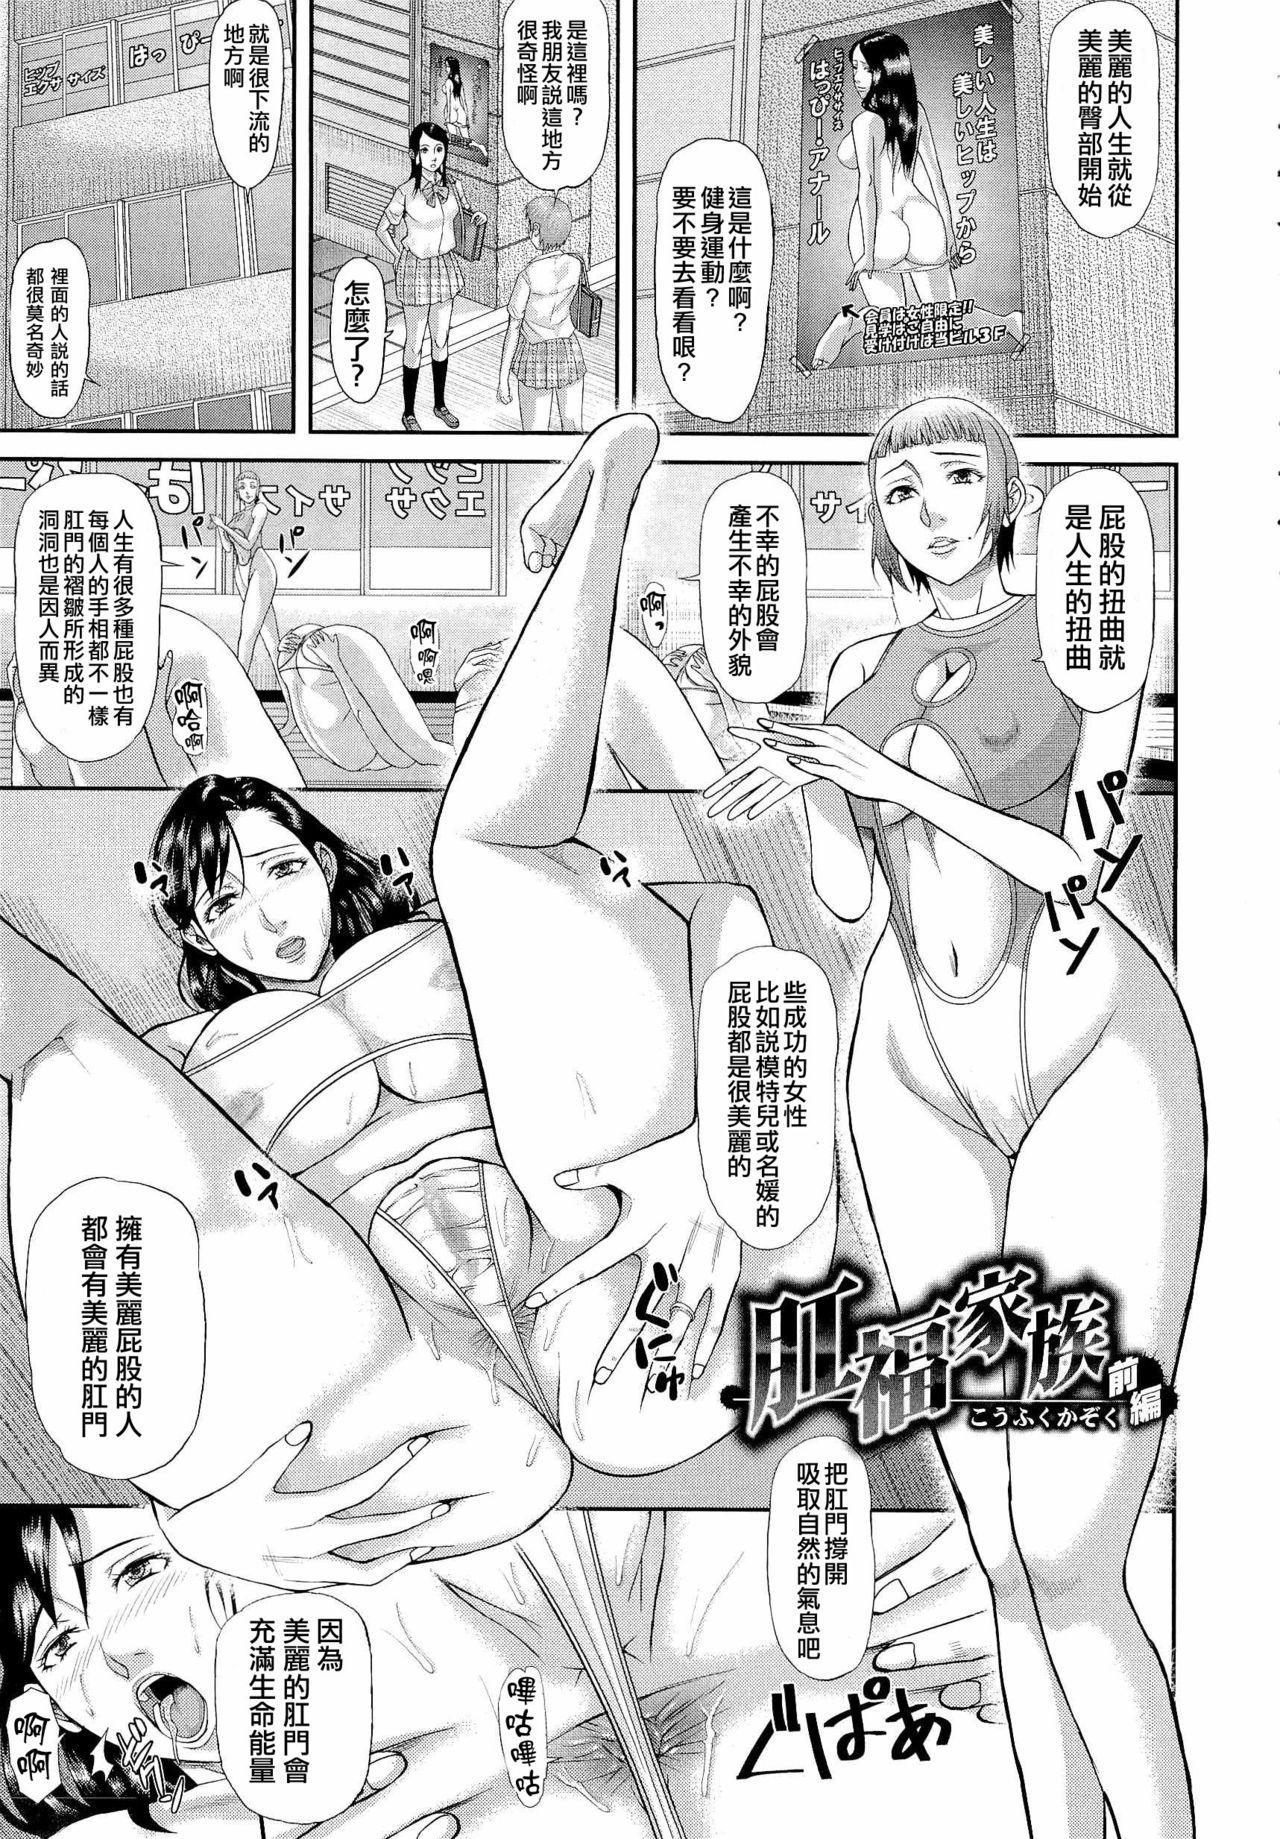 [Honebuto Danshaku] Innou Kaizou Program ~Oyako Zecchou Cult Ochi~ [Chinese]【不想记名重嵌--高质量图源】 8